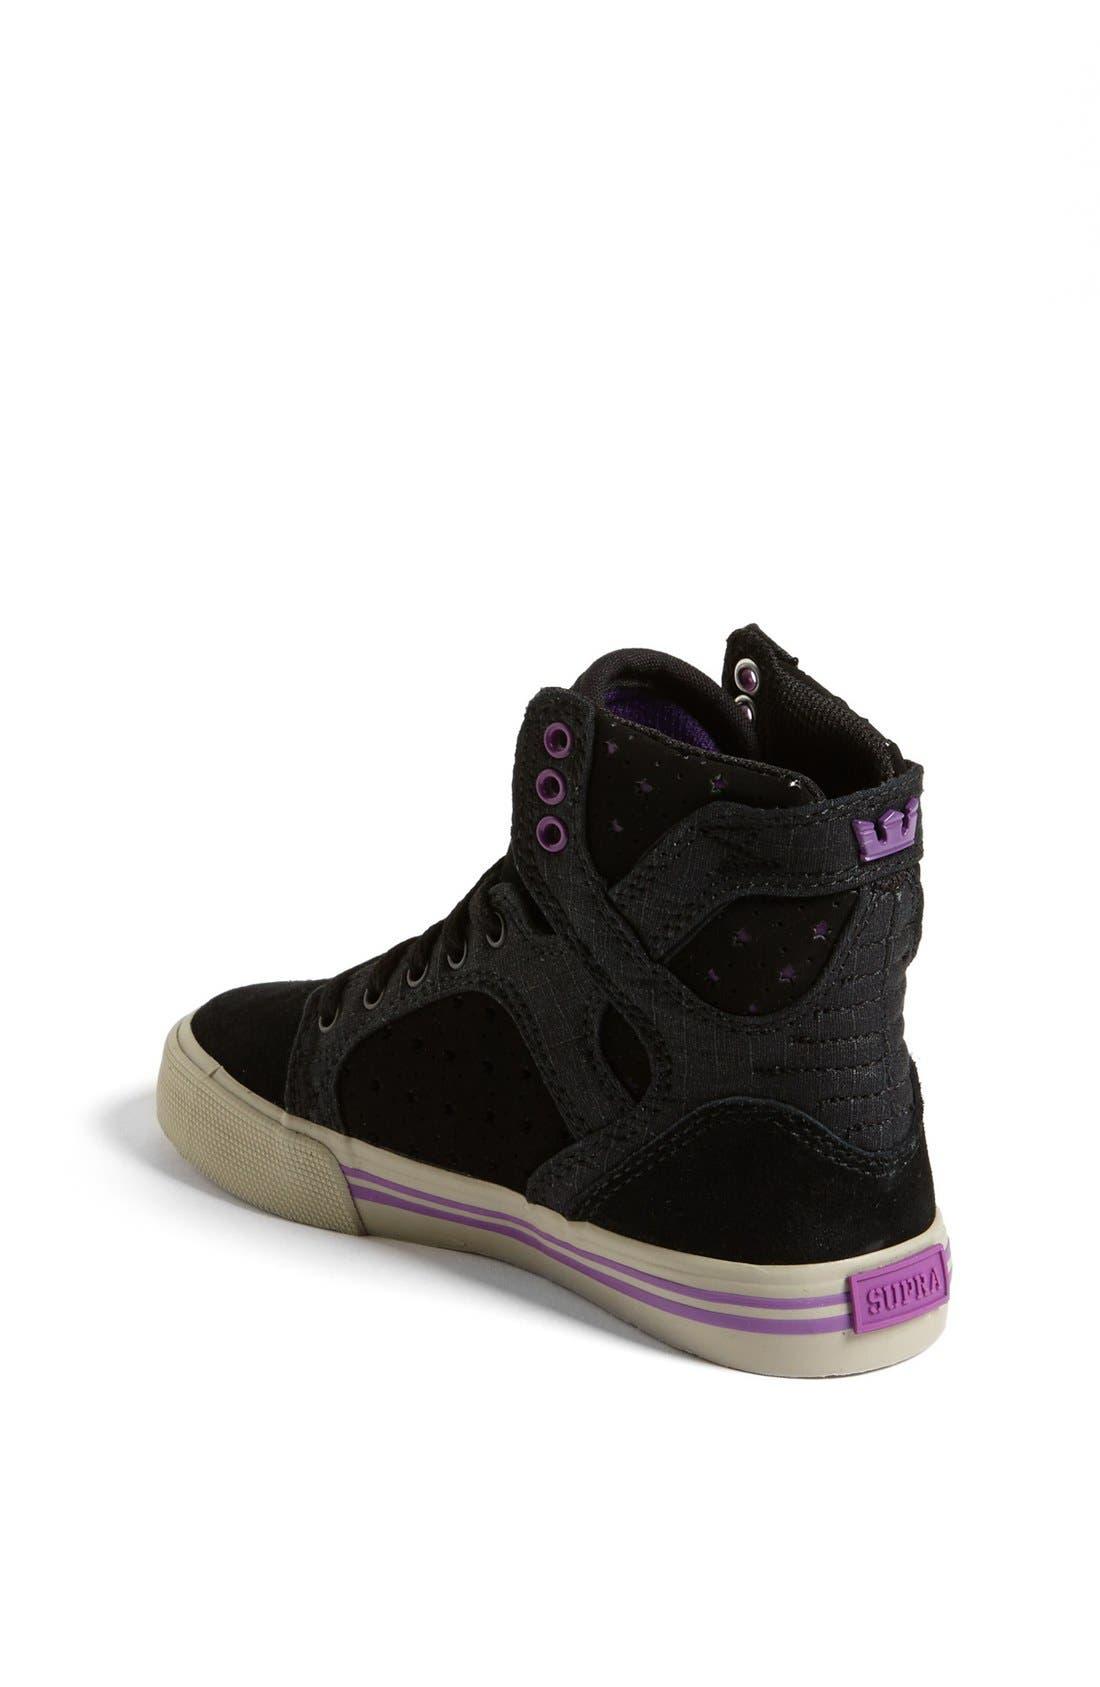 Alternate Image 2  - Supra 'Skytop' Sneaker (Toddler, Little Kid & Big Kid)